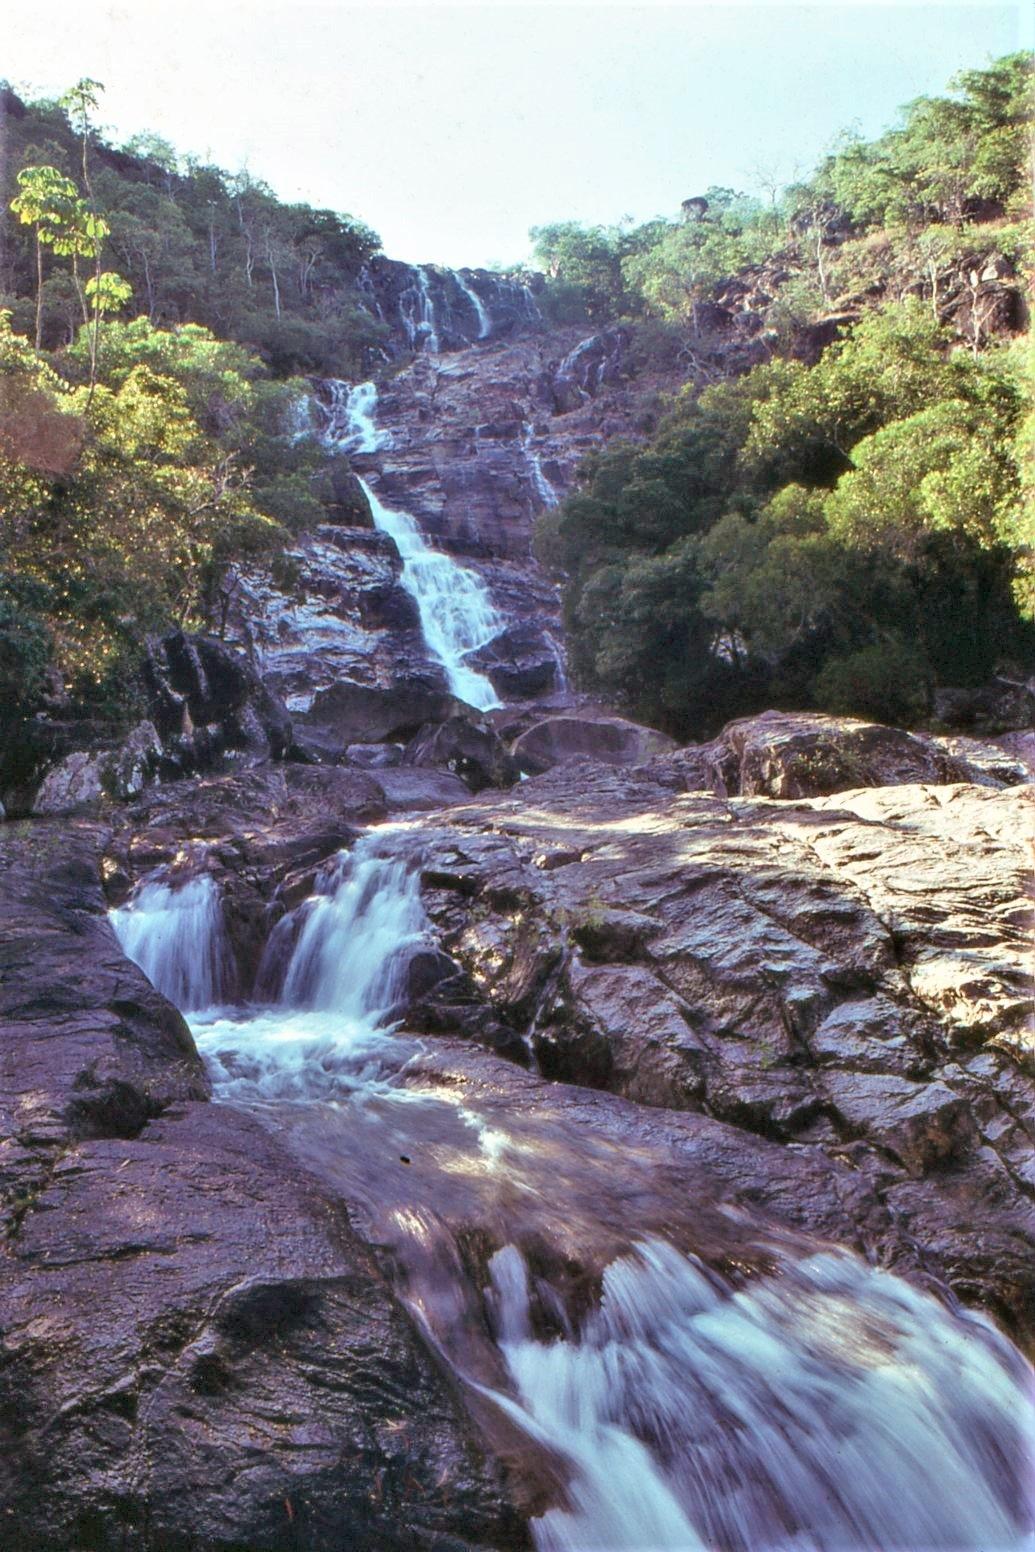 Peach Creek Falls by dittums12